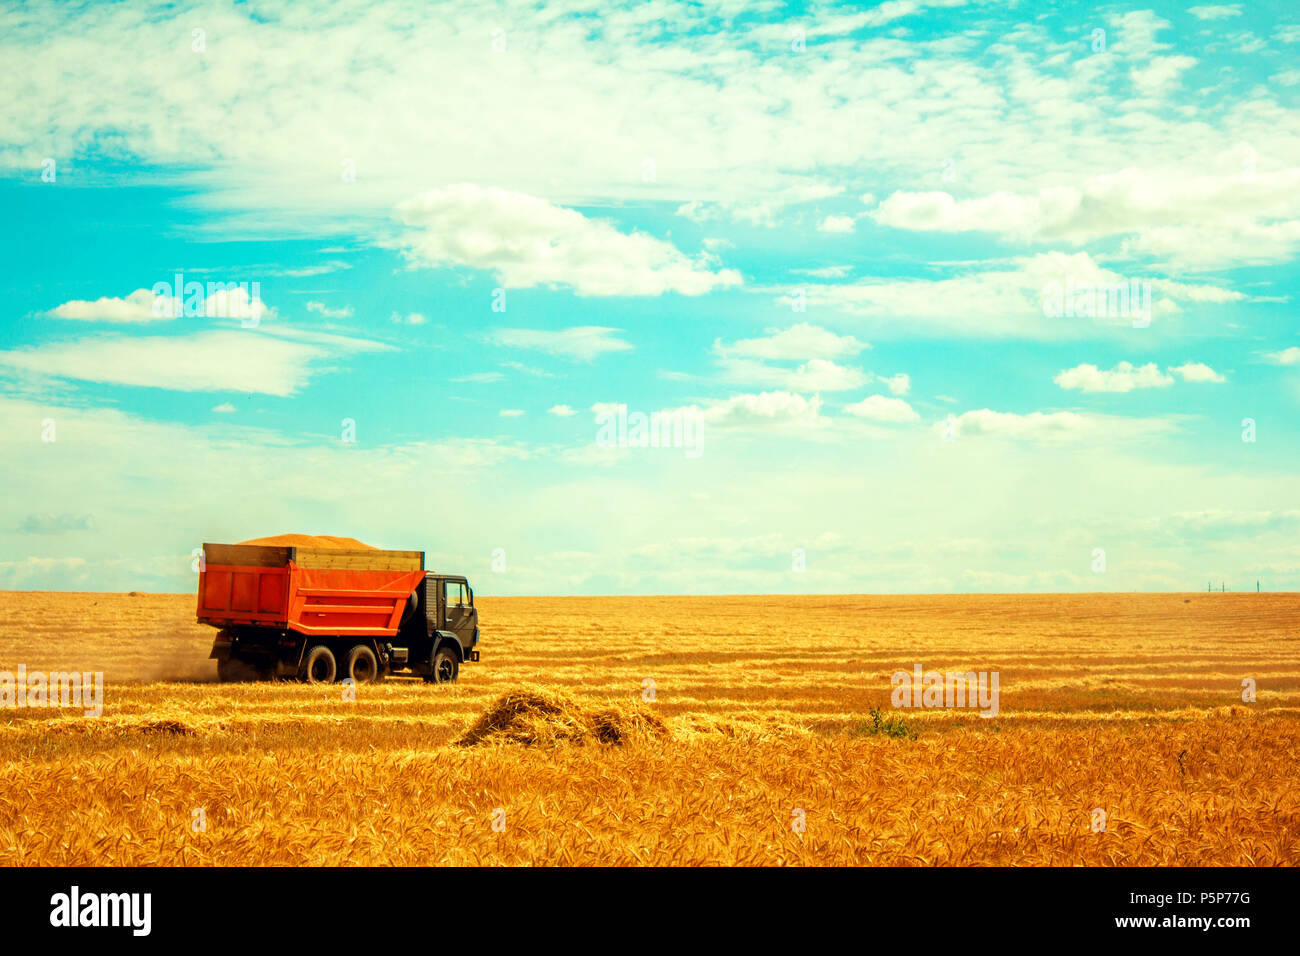 truck on field - Stock Image